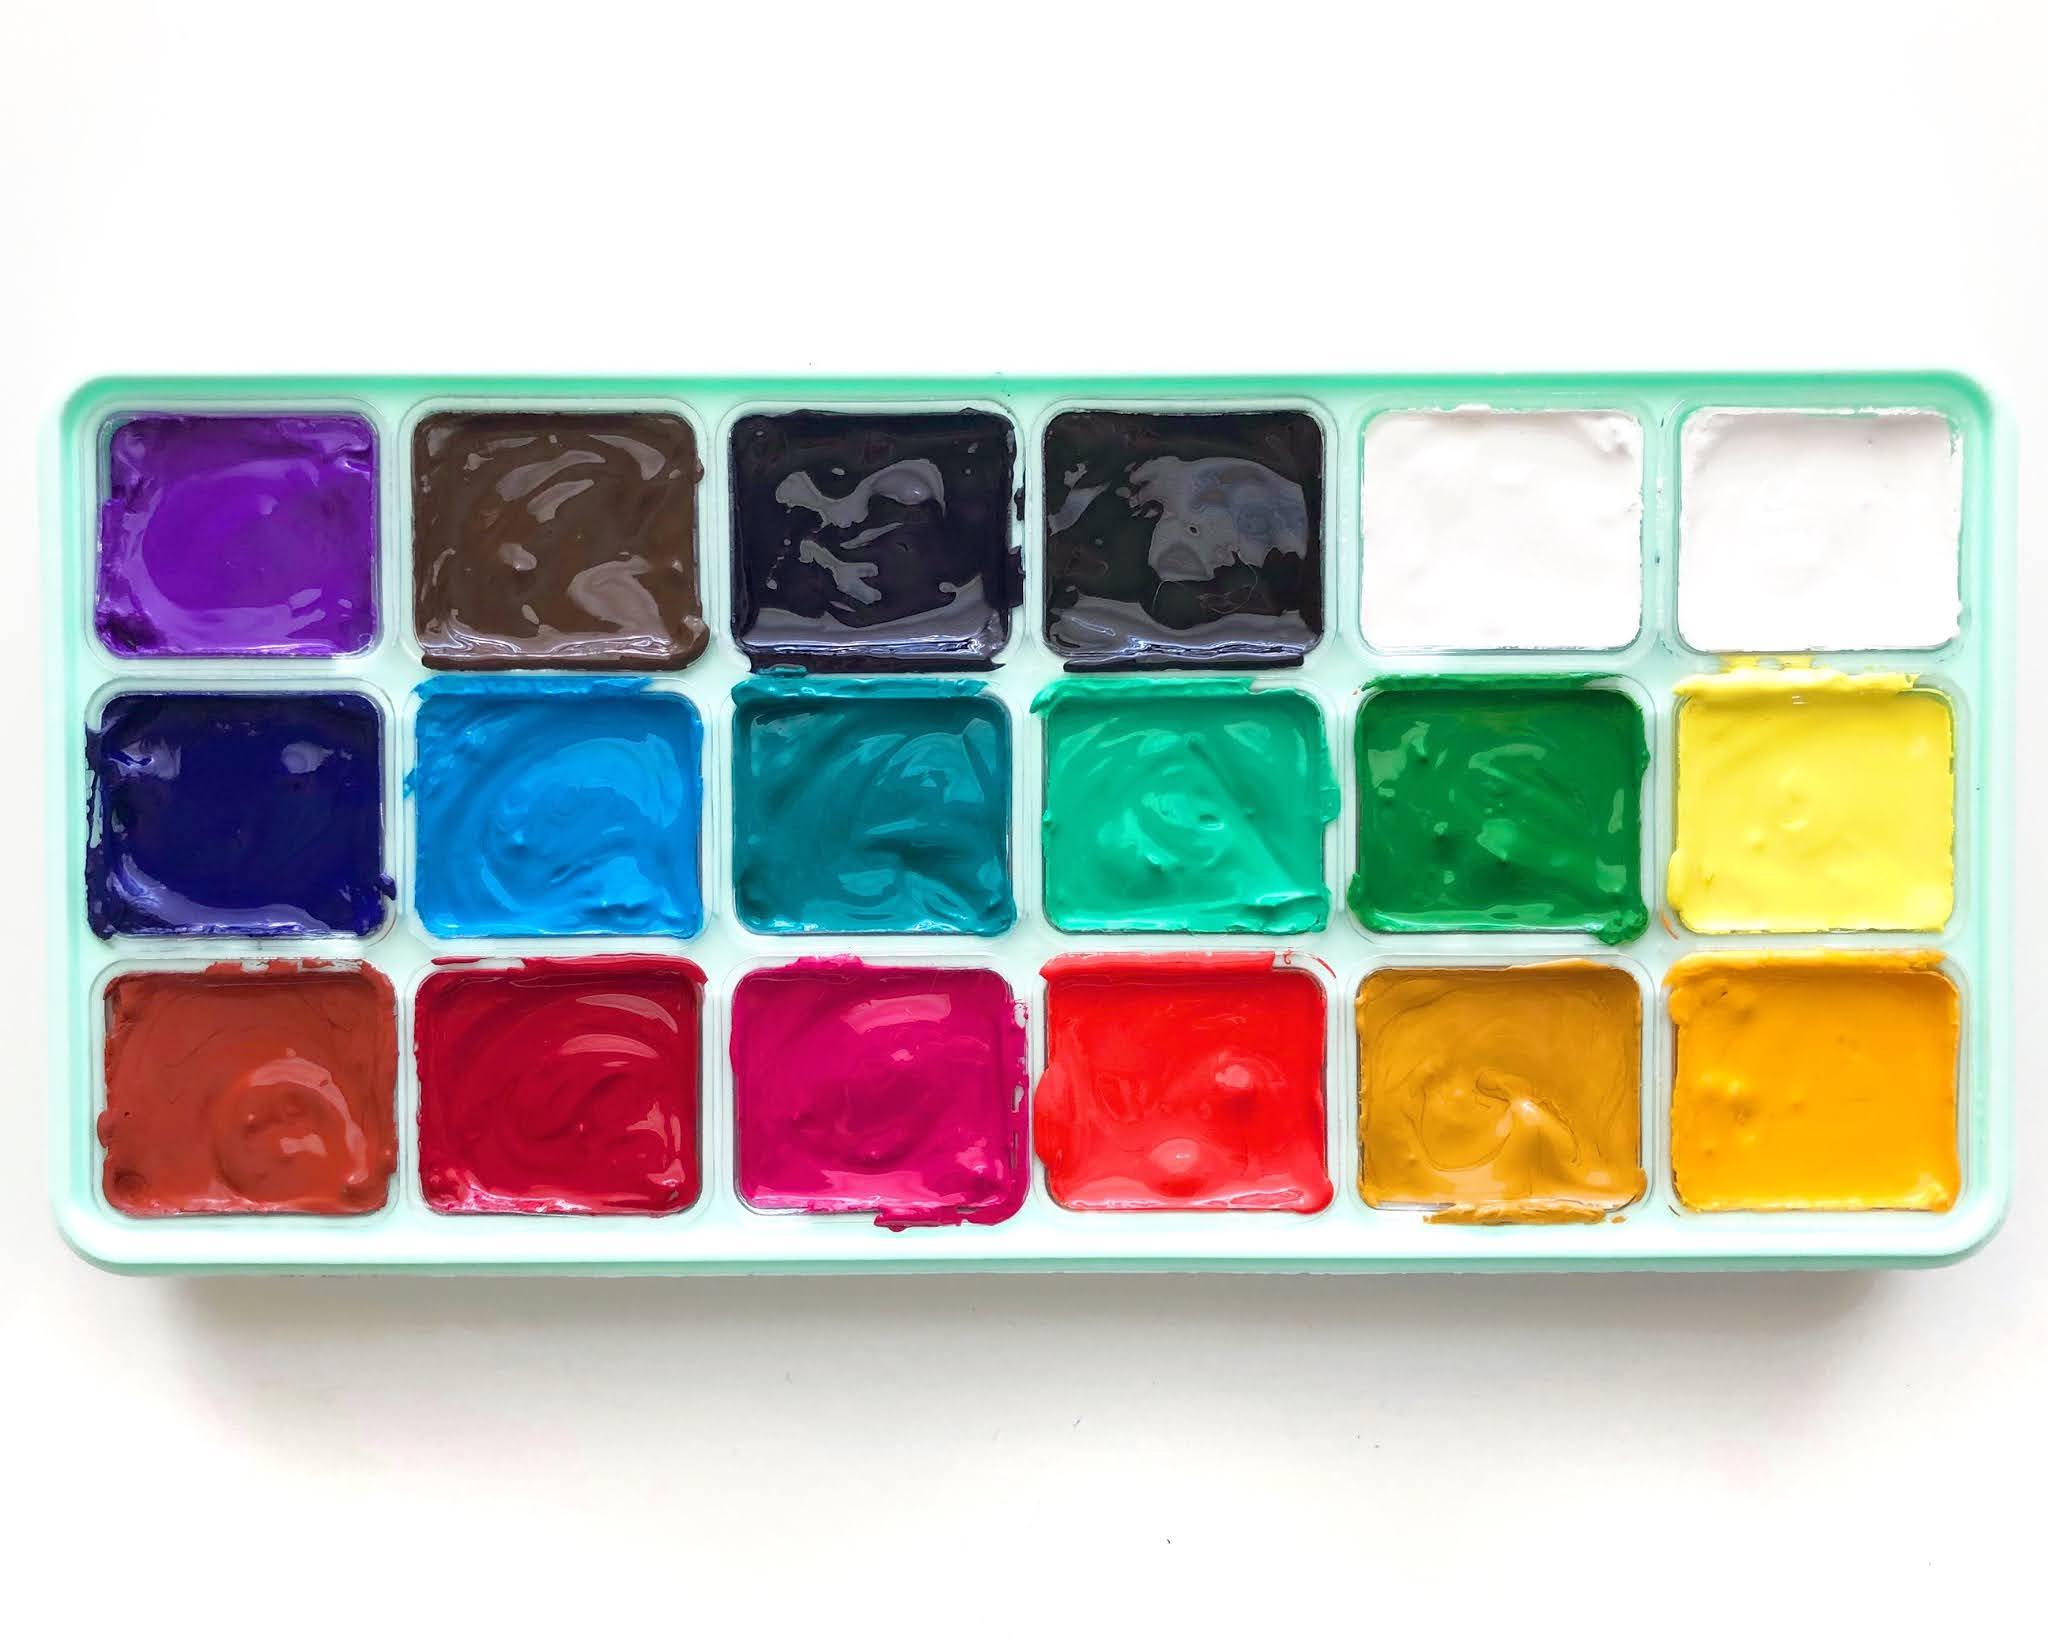 Miya Gouache Paint Set Review